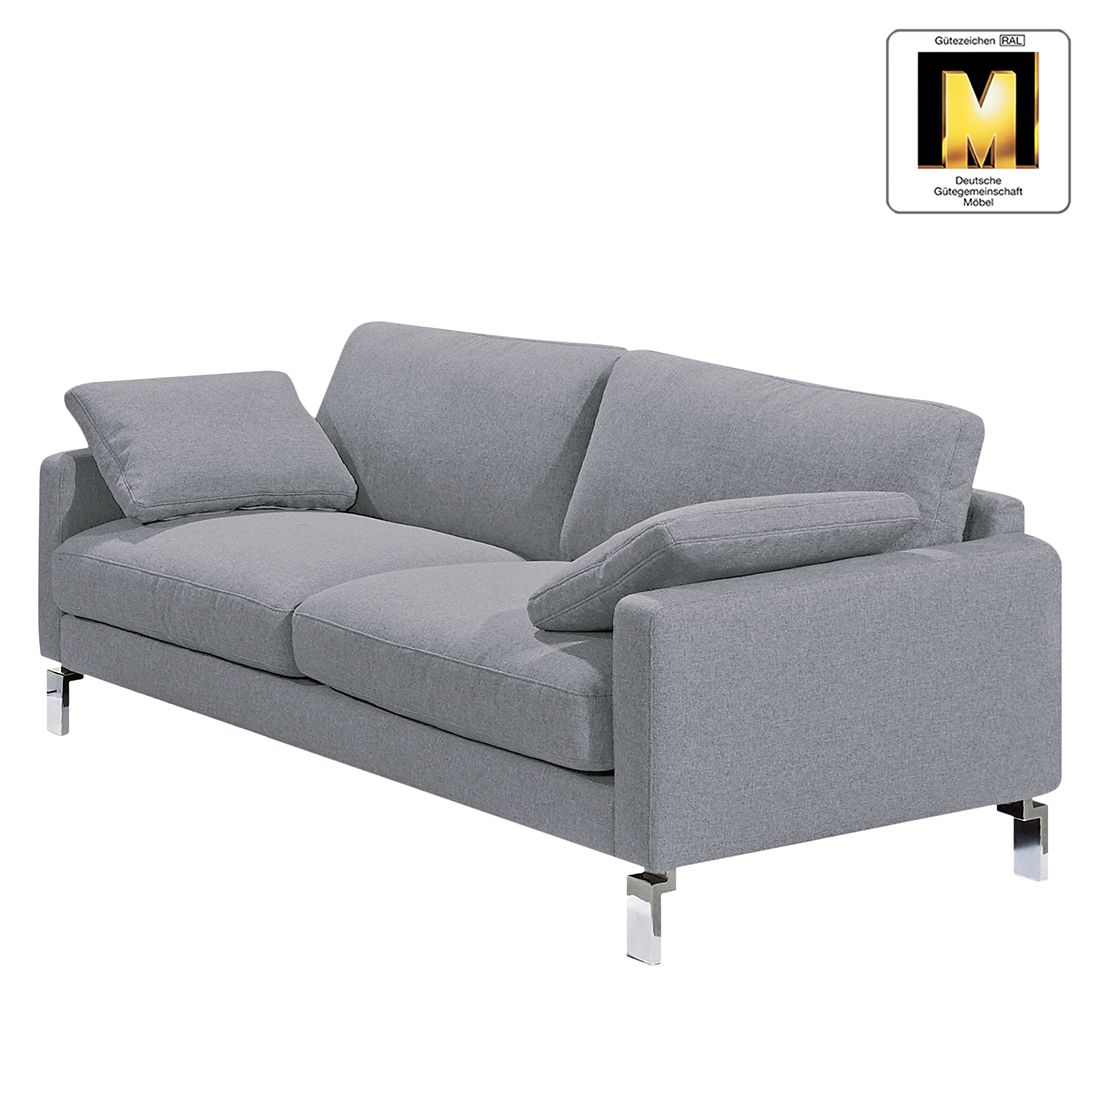 Sofa Casual Line IV (3-Sitzer) – Velours – Silbergrau, Claas Claasen jetzt kaufen